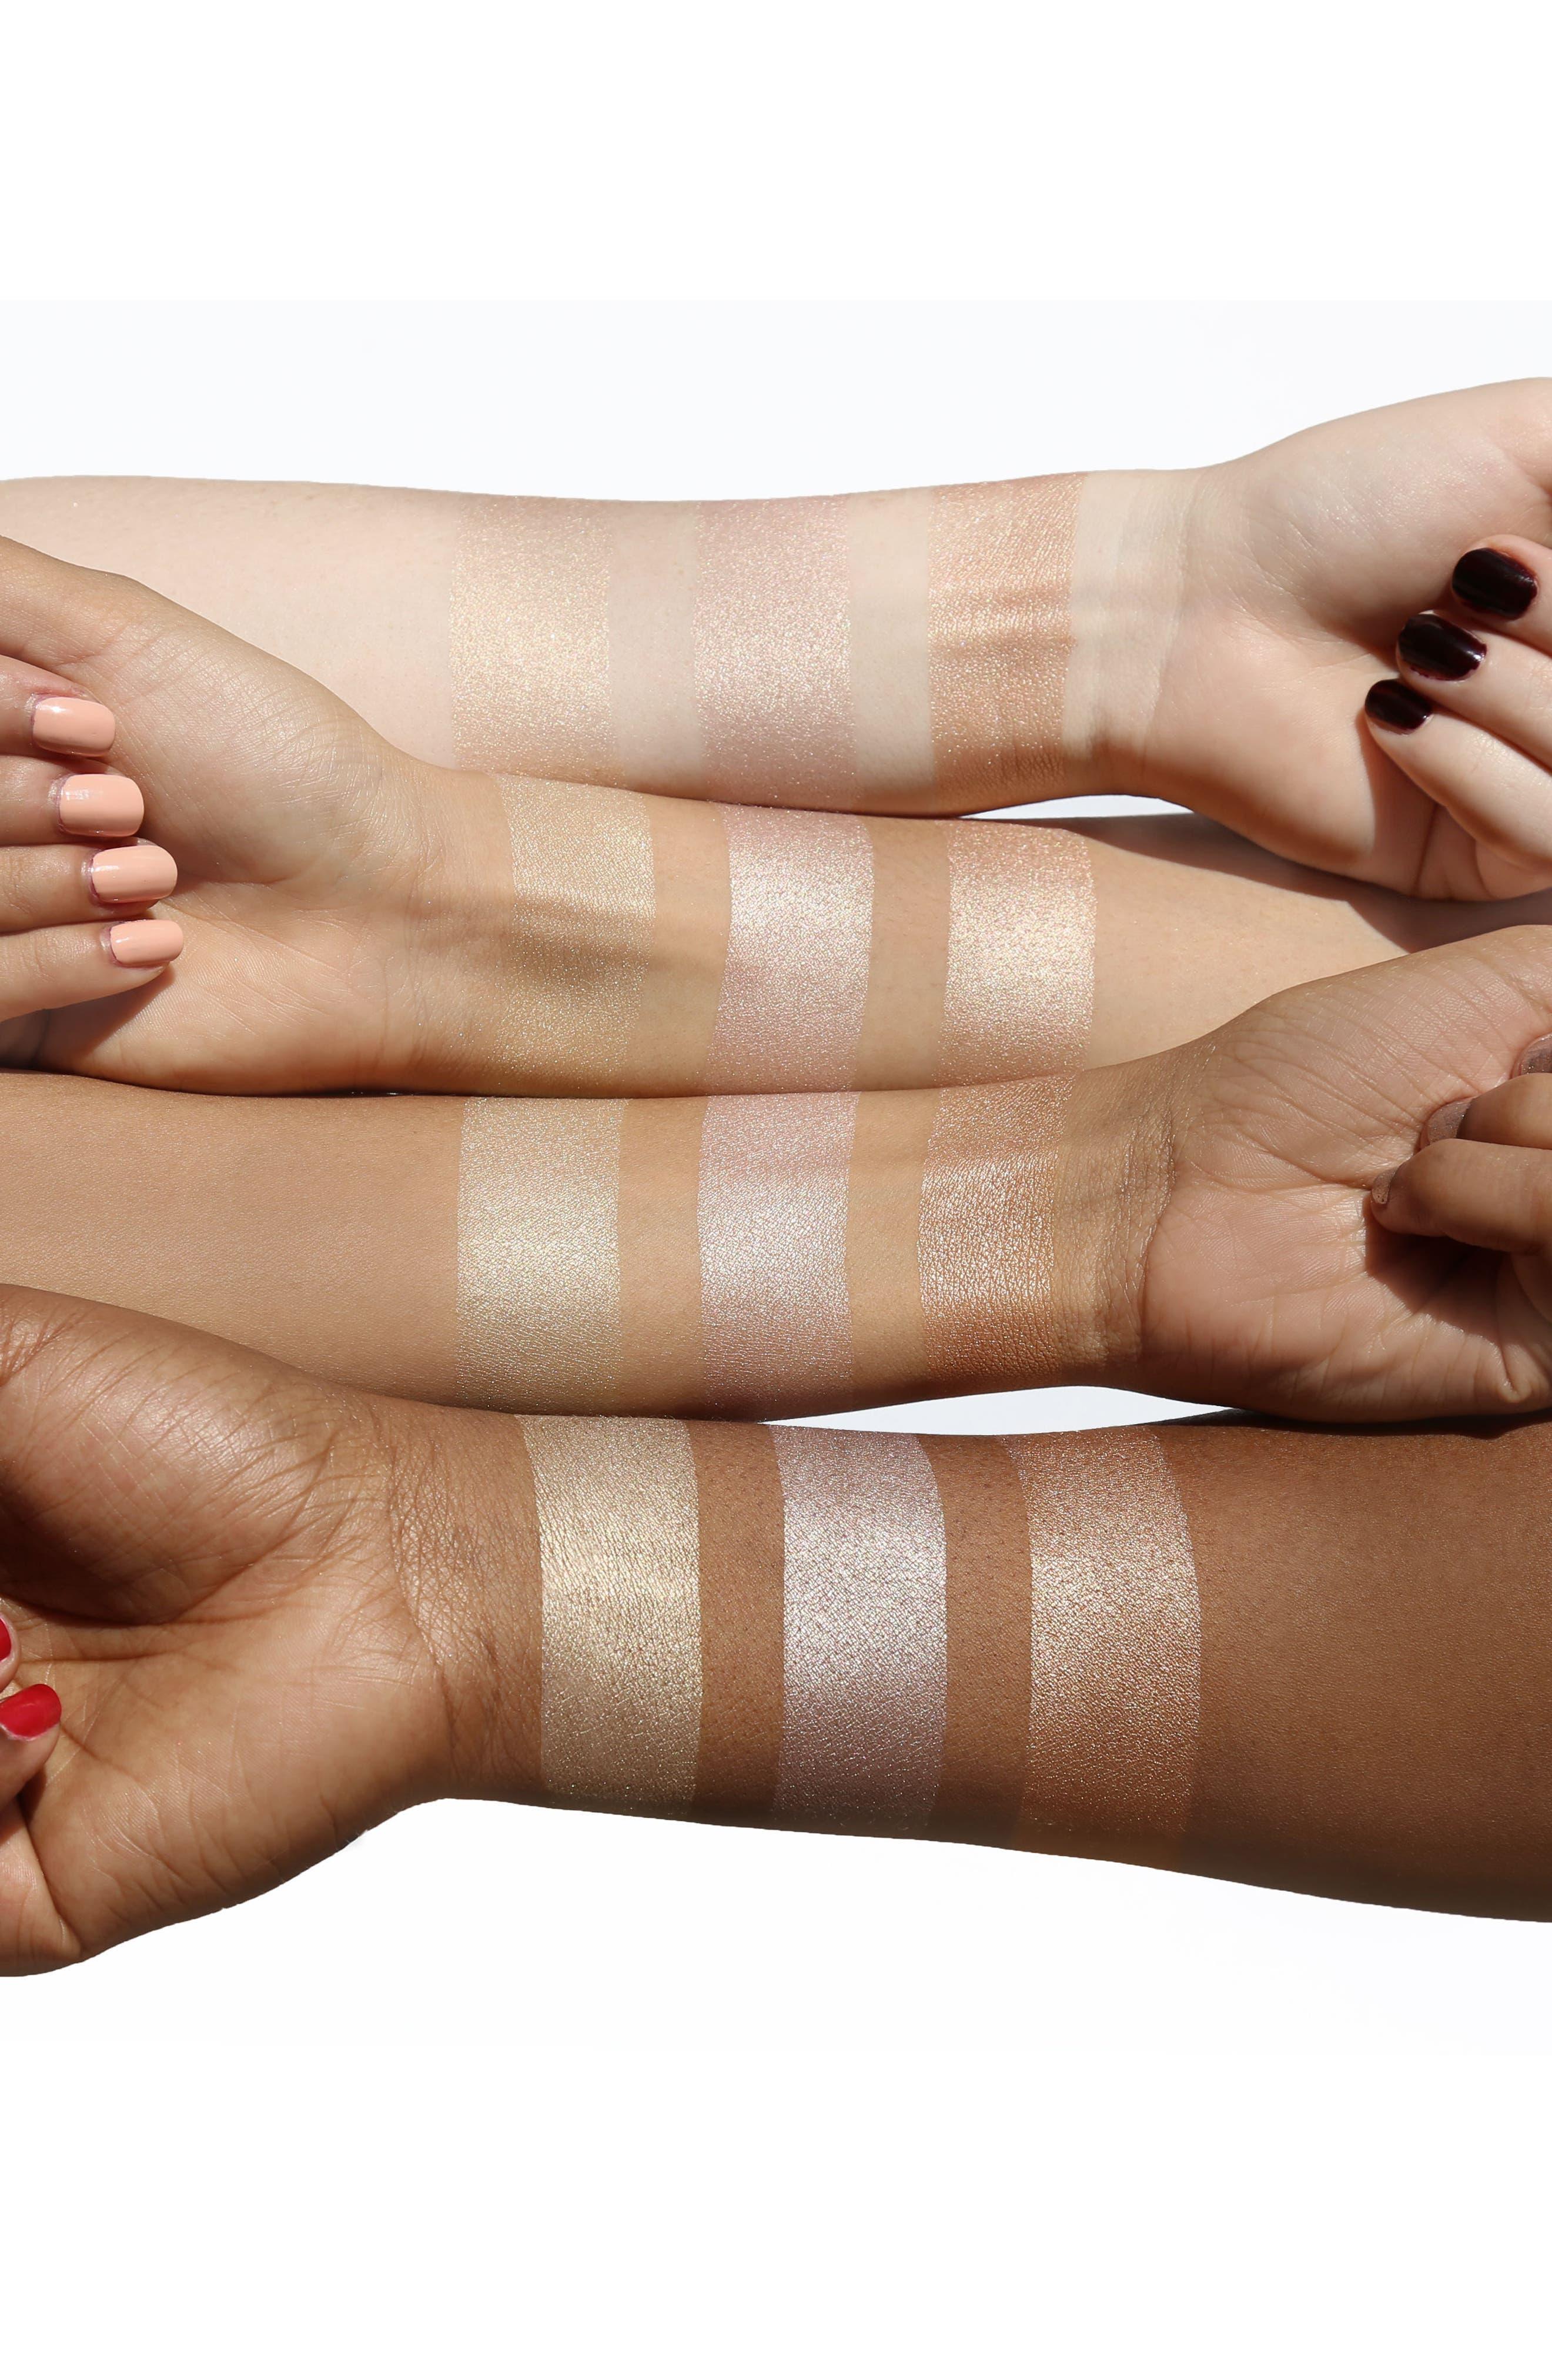 Skinny Dip, Peach & Rose Gold Powder Highlighter Trio,                             Alternate thumbnail 2, color,                             No Color